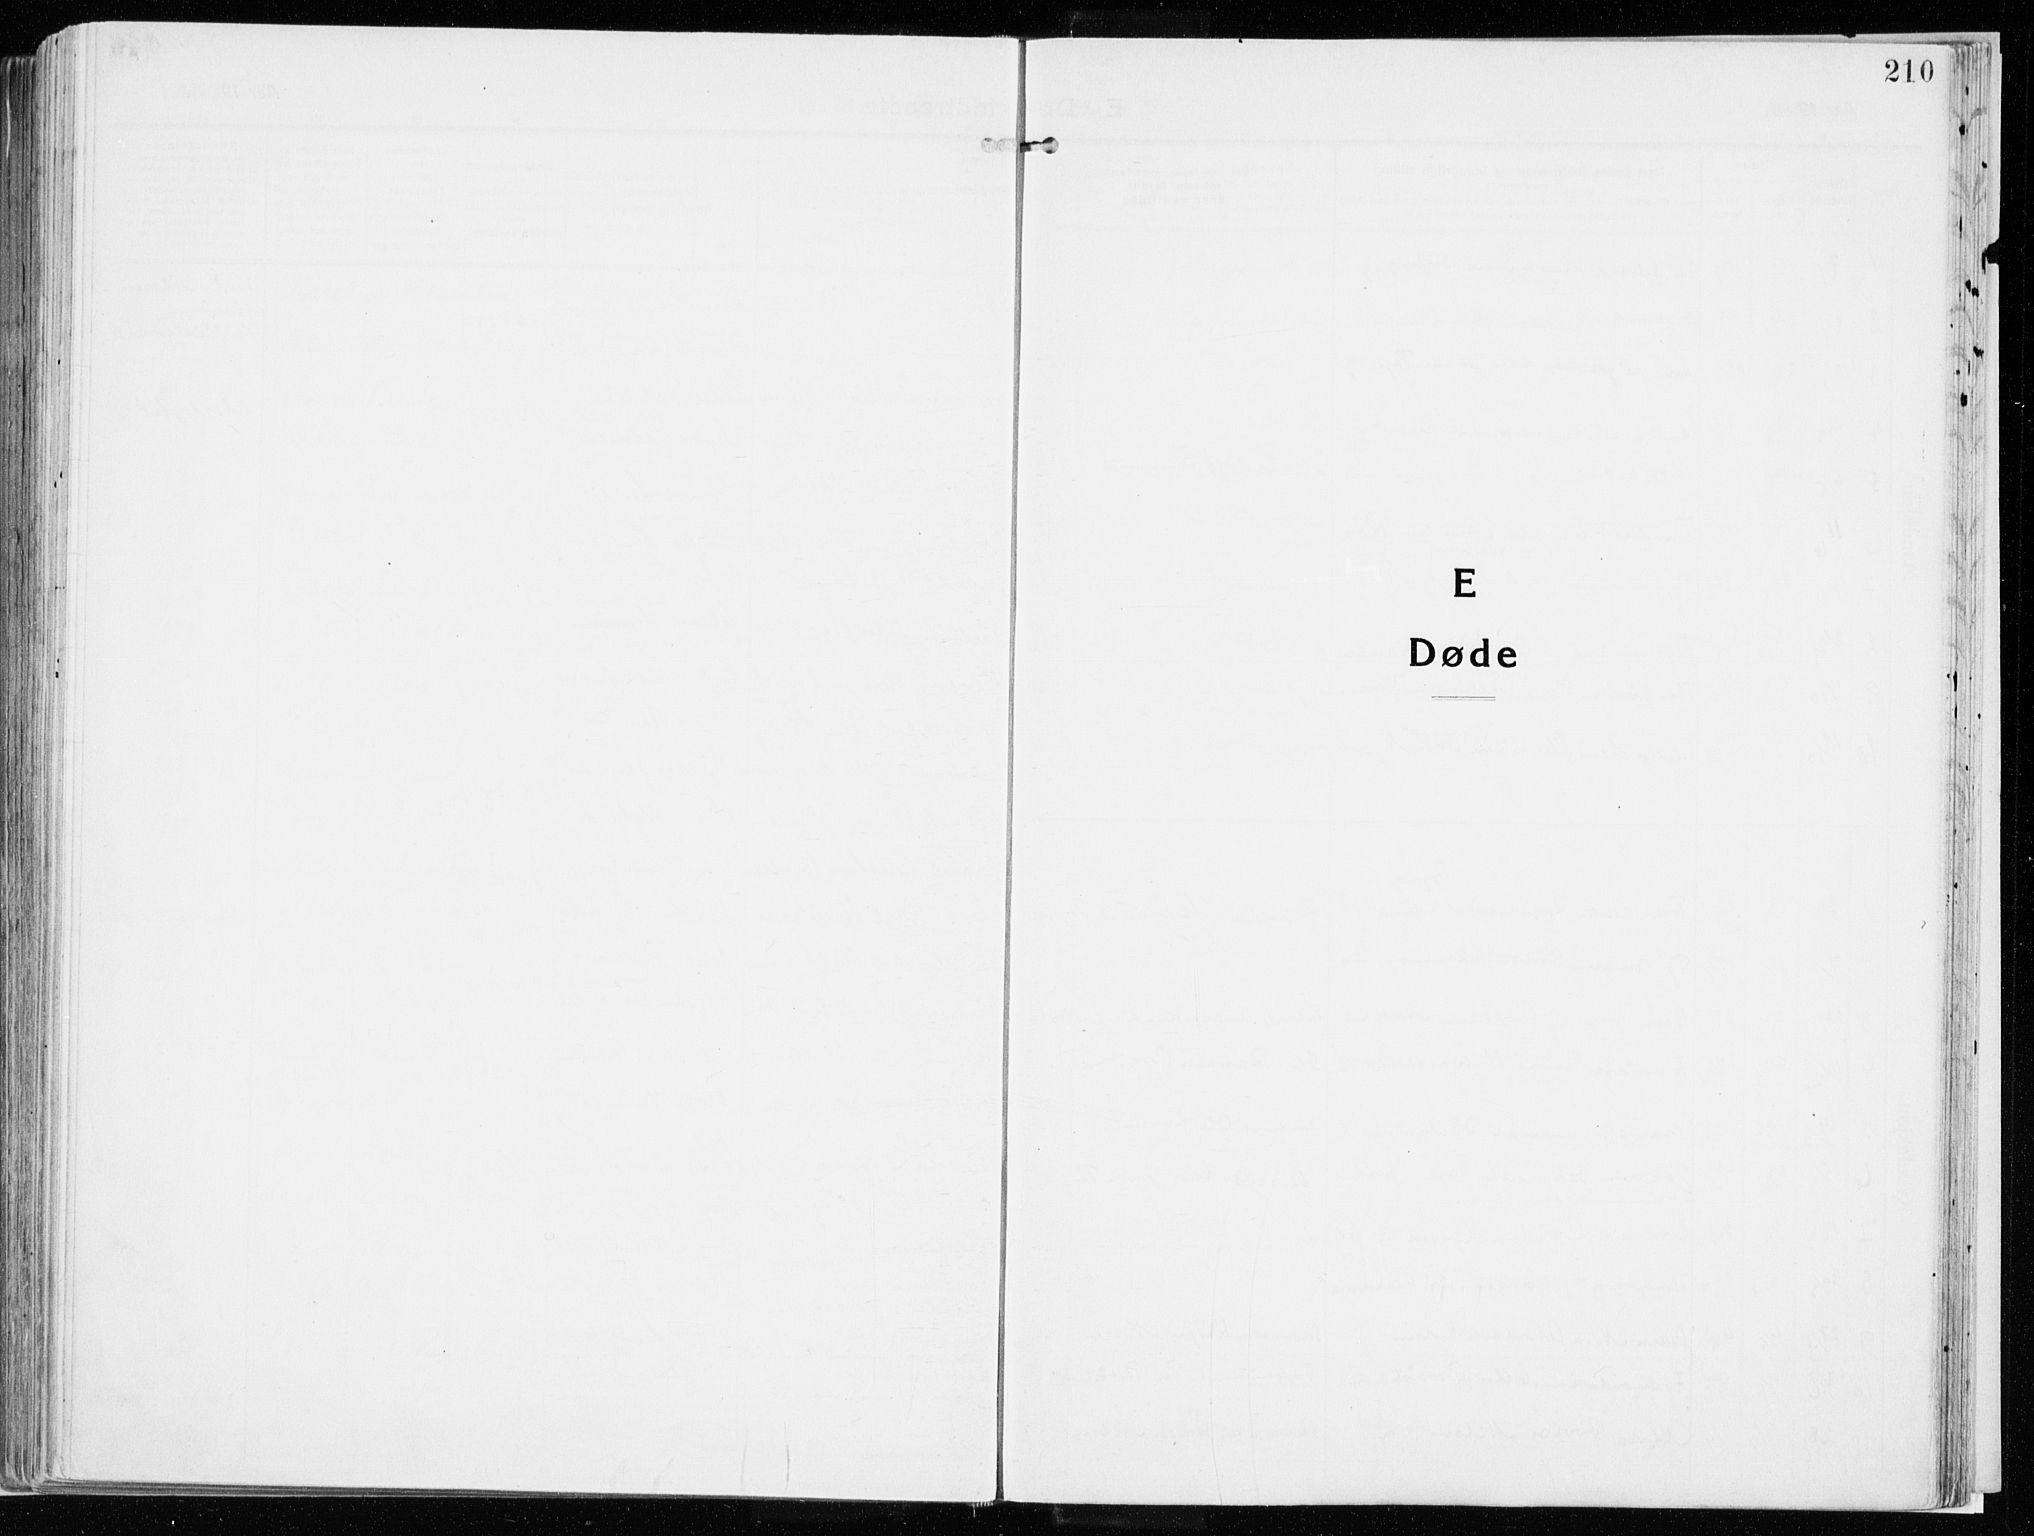 SAH, Vardal prestekontor, H/Ha/Haa/L0017: Ministerialbok nr. 17, 1915-1929, s. 210